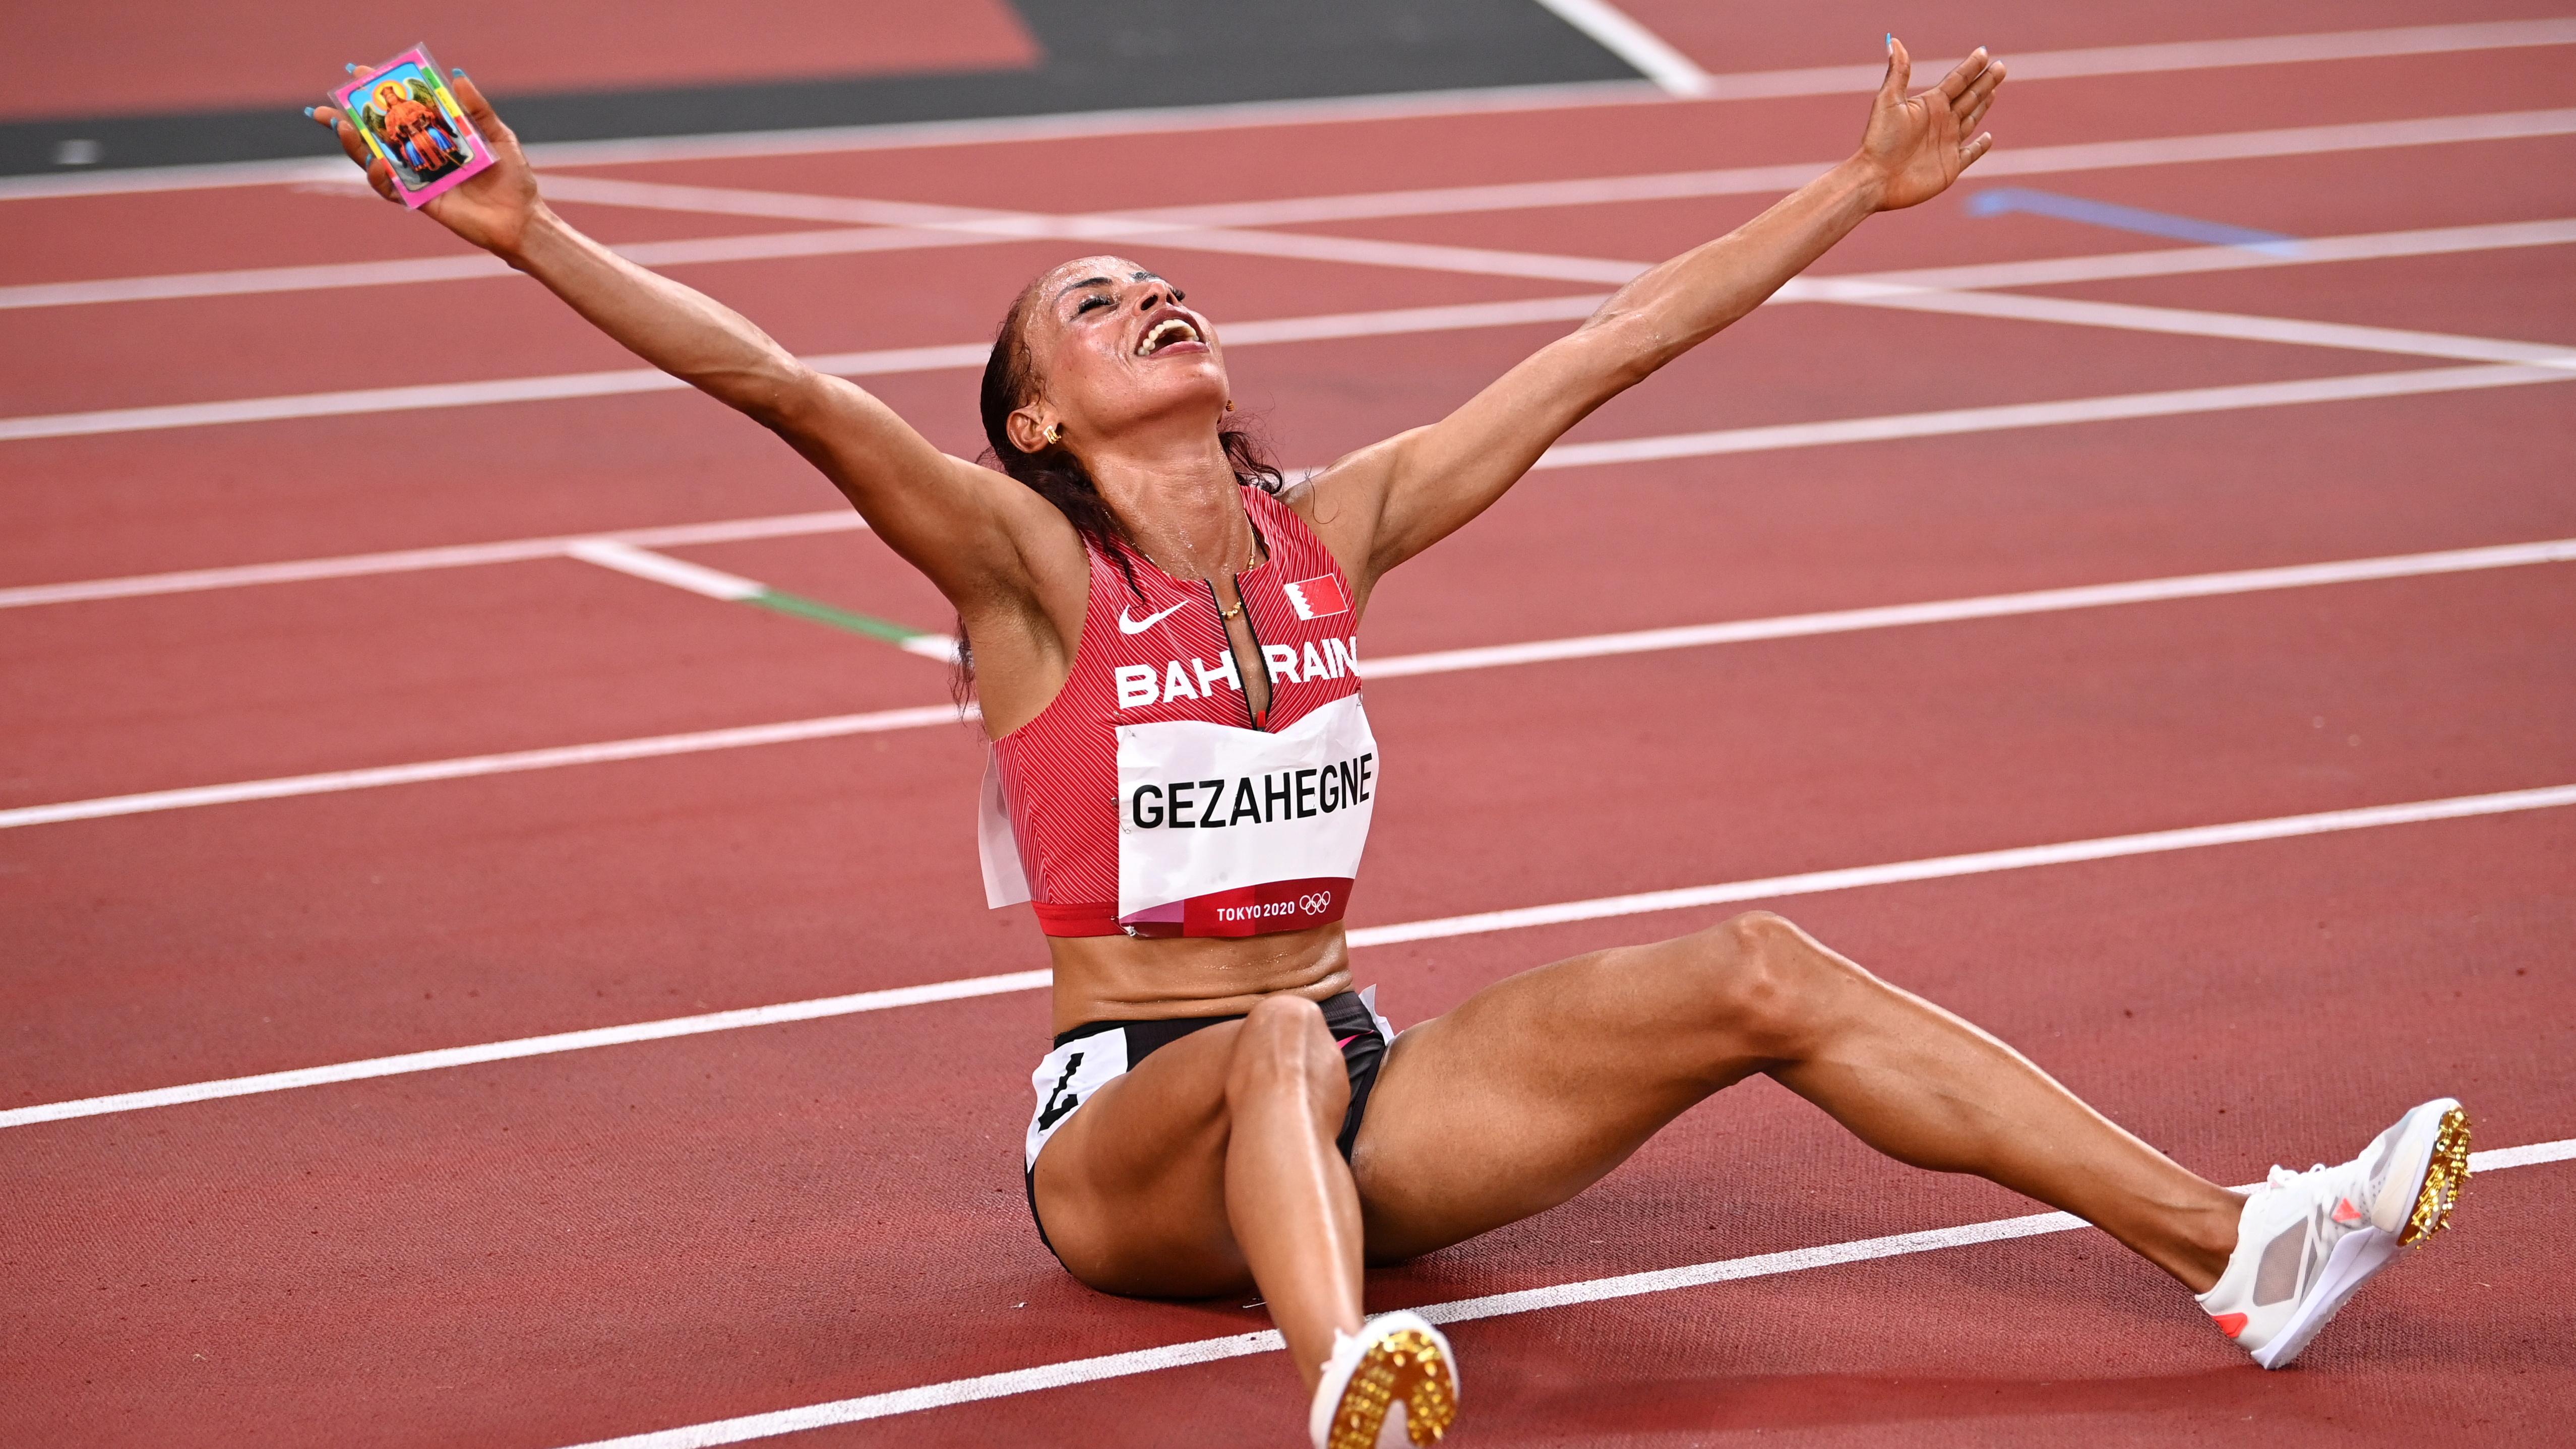 Tokyo 2020 Olympics - Athletics - Women's 10000m - Olympic Stadium, Tokyo, Japan - August 7, 2021. Kalkidan Gezahegne of Bahrain celebrates after winning silver REUTERS/Dylan Martinez